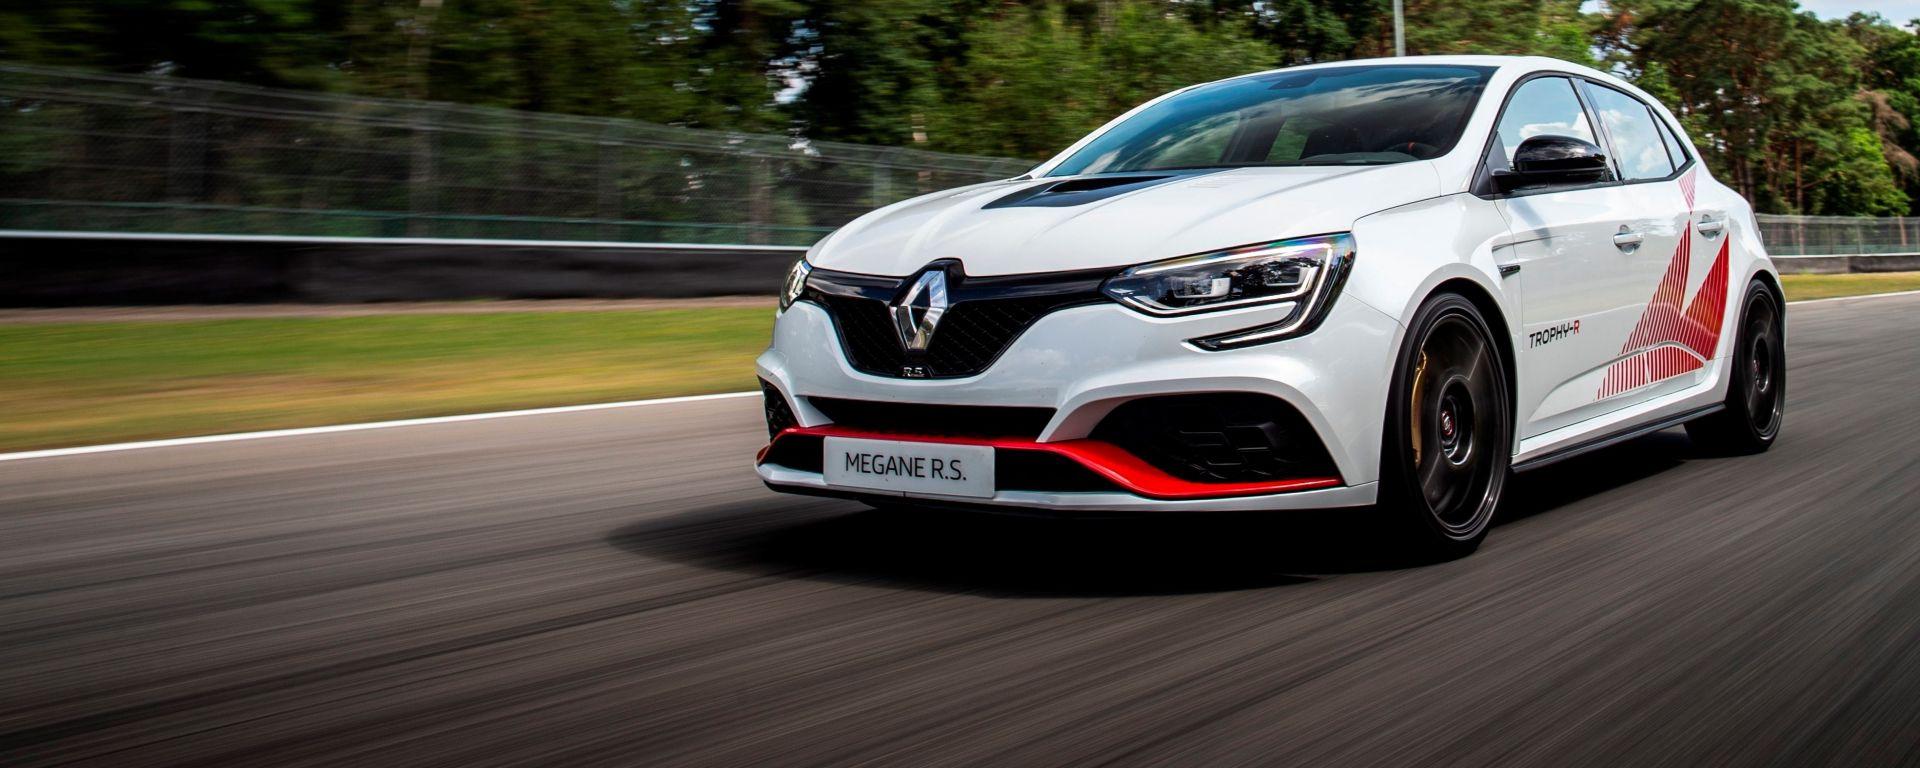 Renault RS Trophy-R in pista